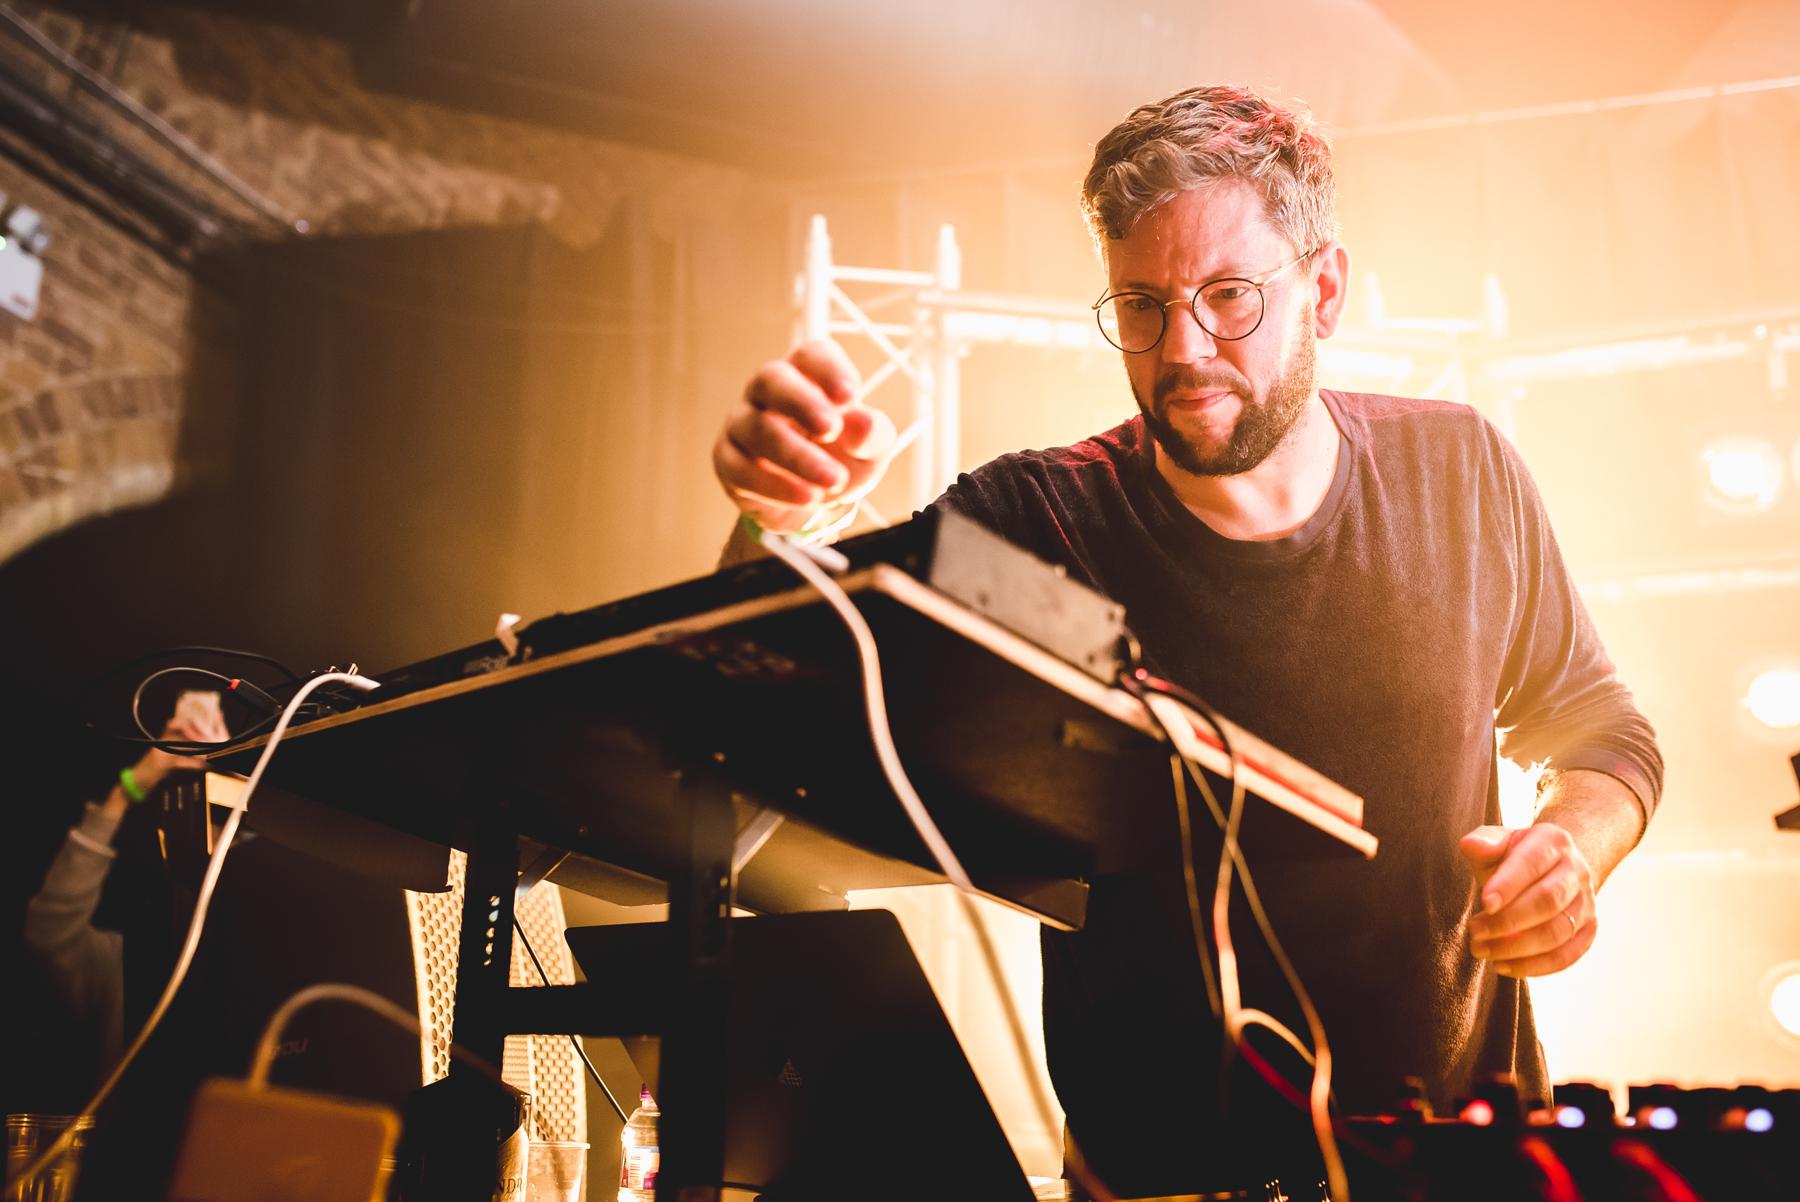 Labyrinth x Melodic Diggers Presents: Âme, Denis Horvat, TERR